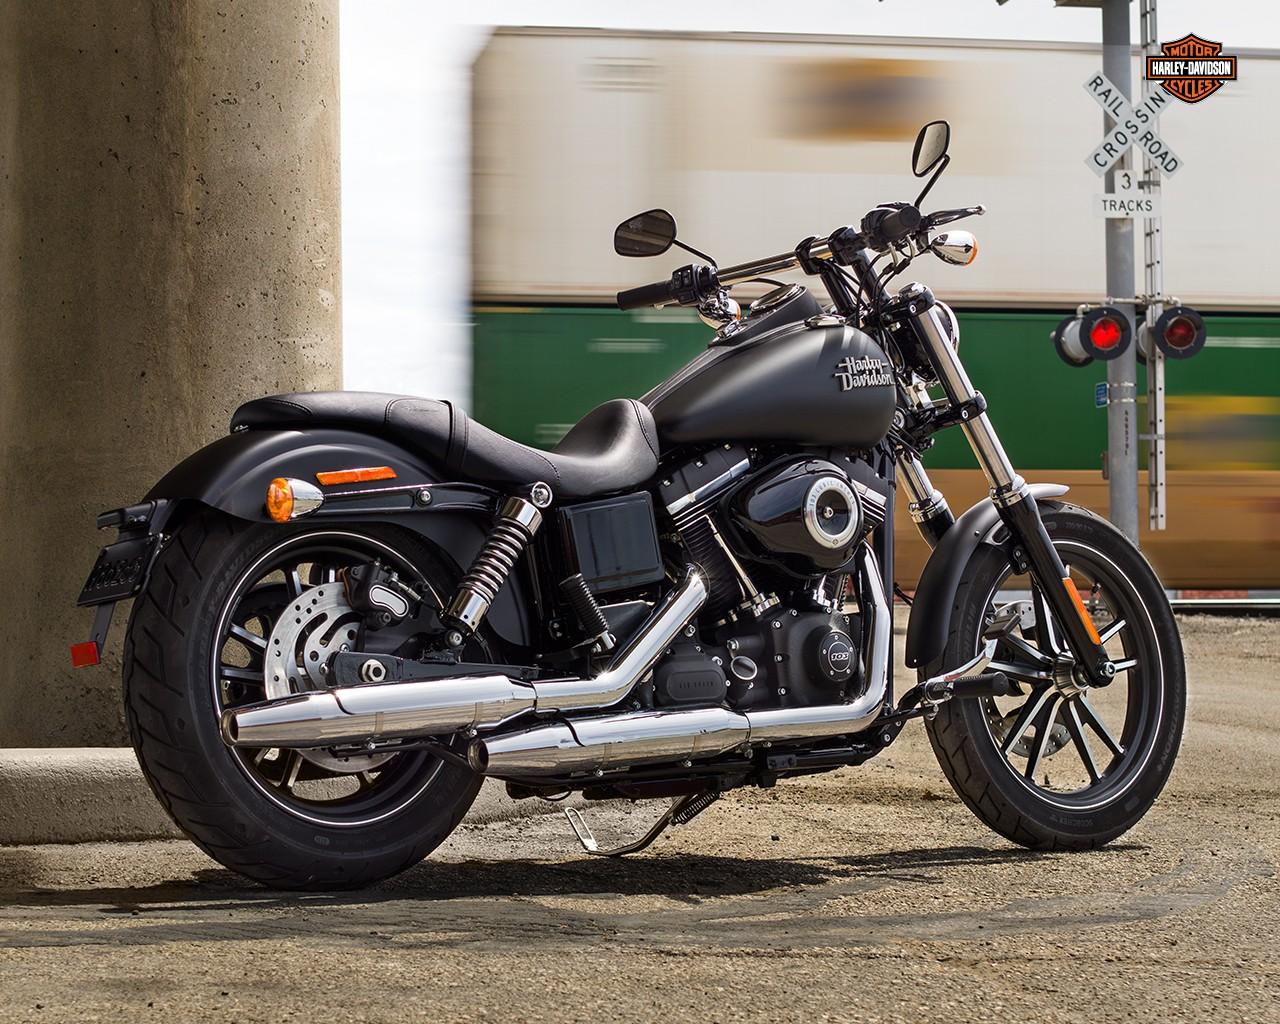 xe moto moi - elle man 7